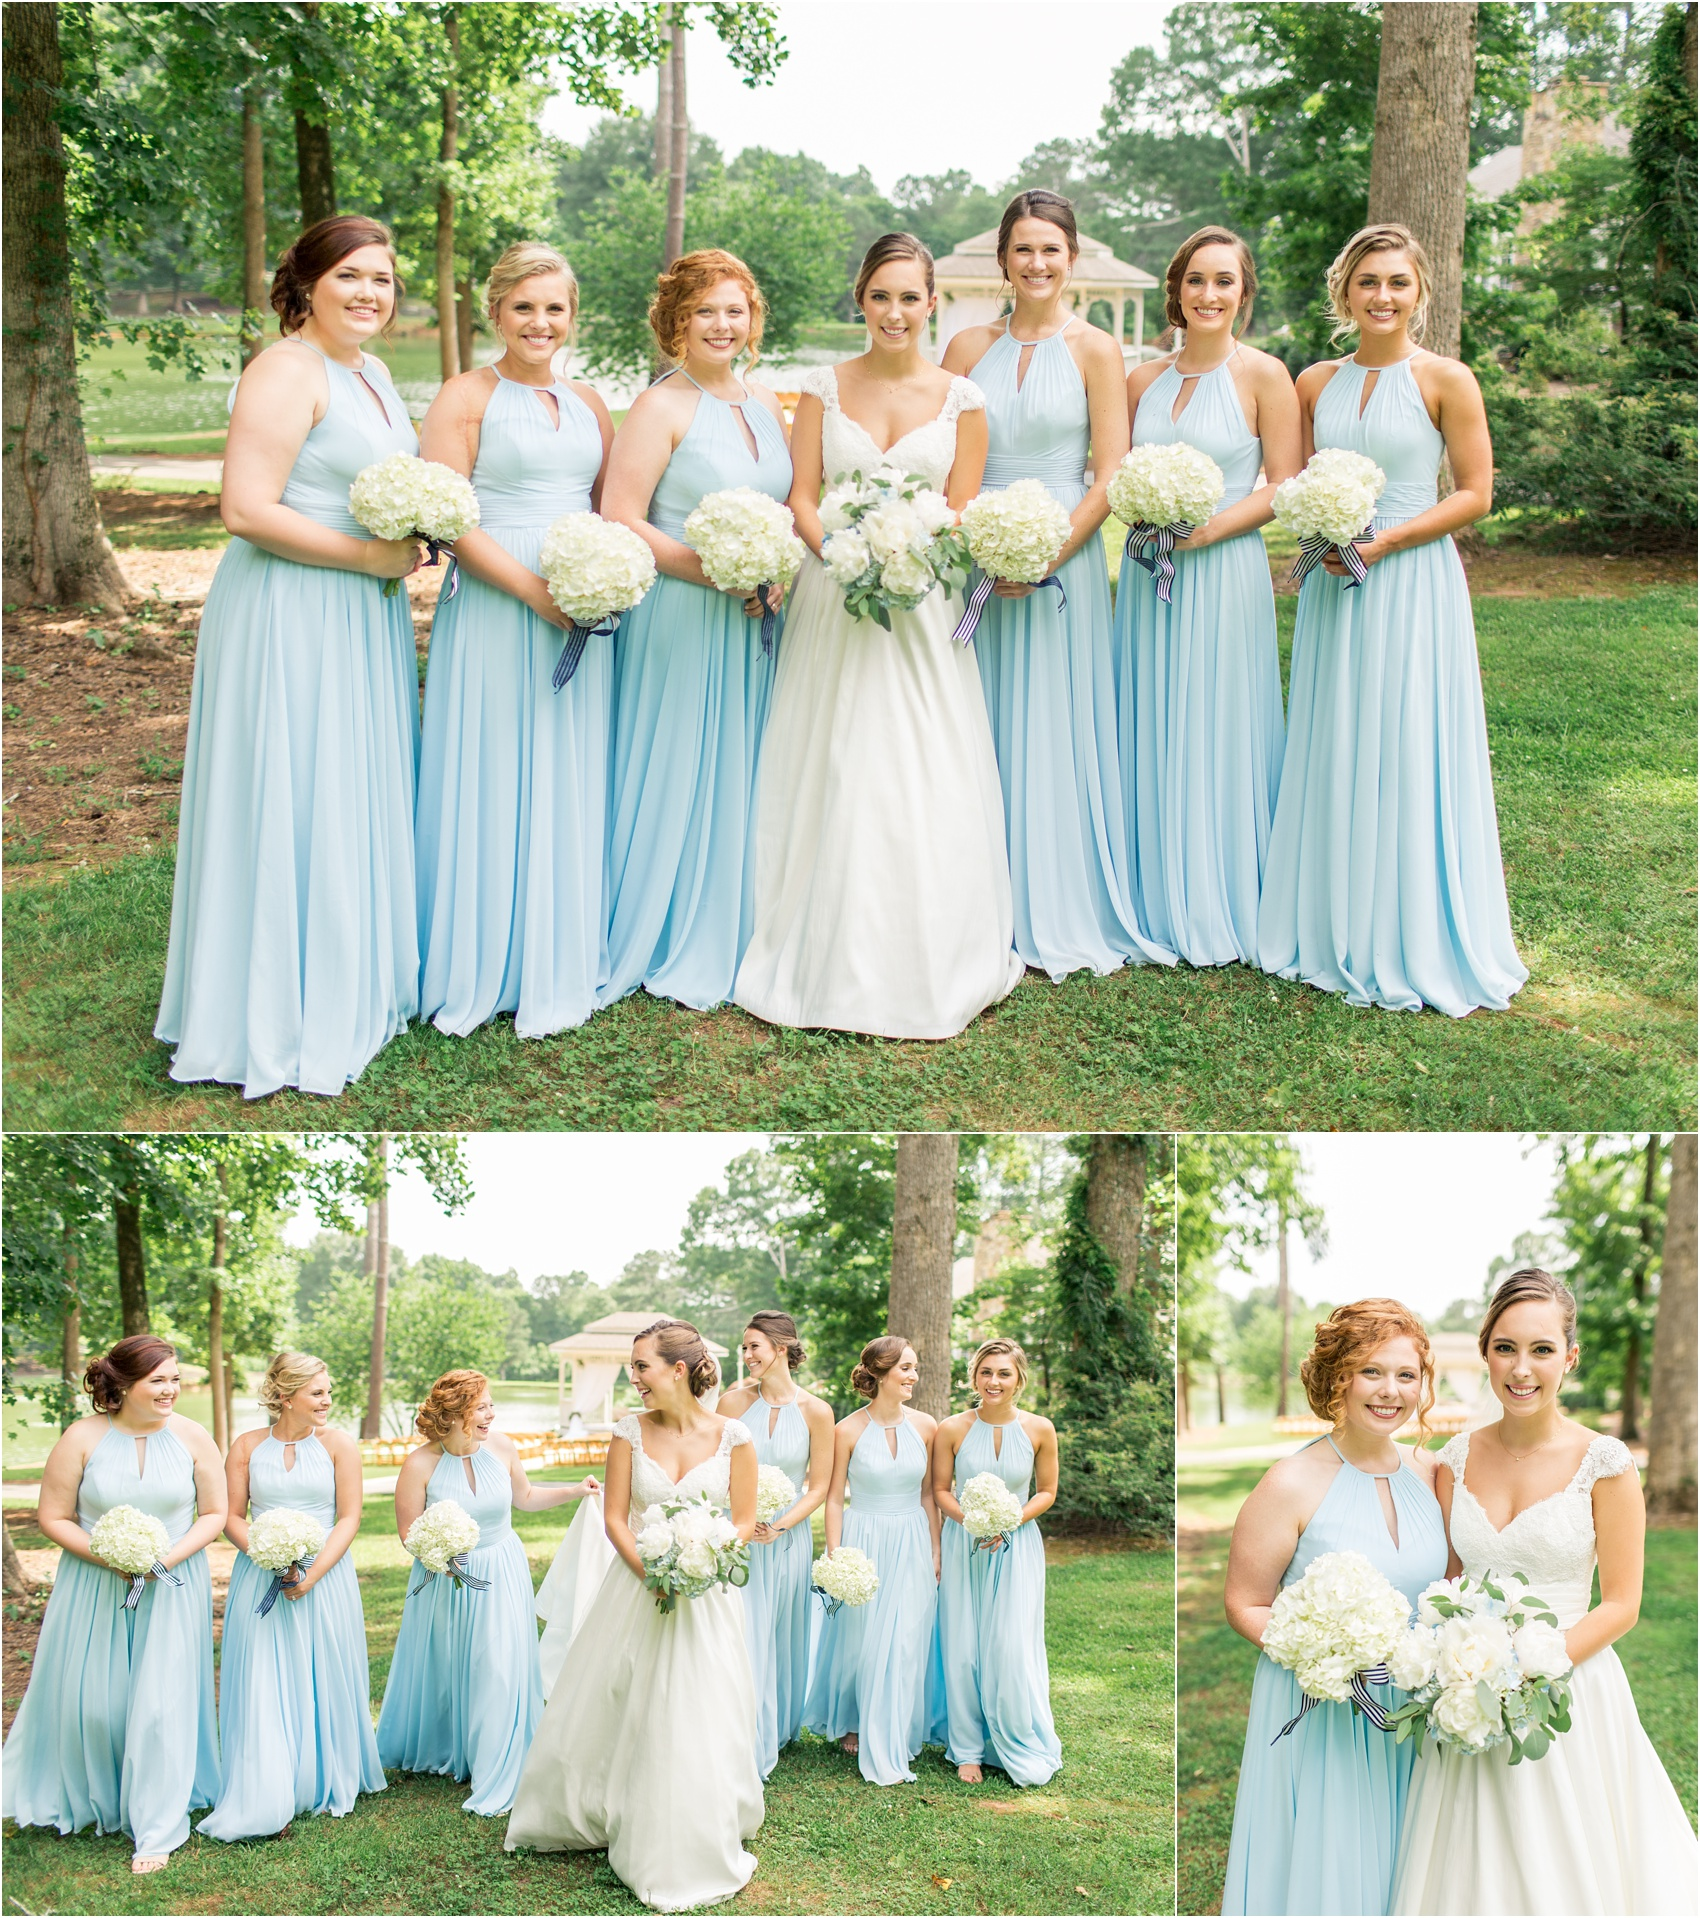 Savannah Eve Photography- Sigl-Adams Wedding- Sneak Peek-19.jpg